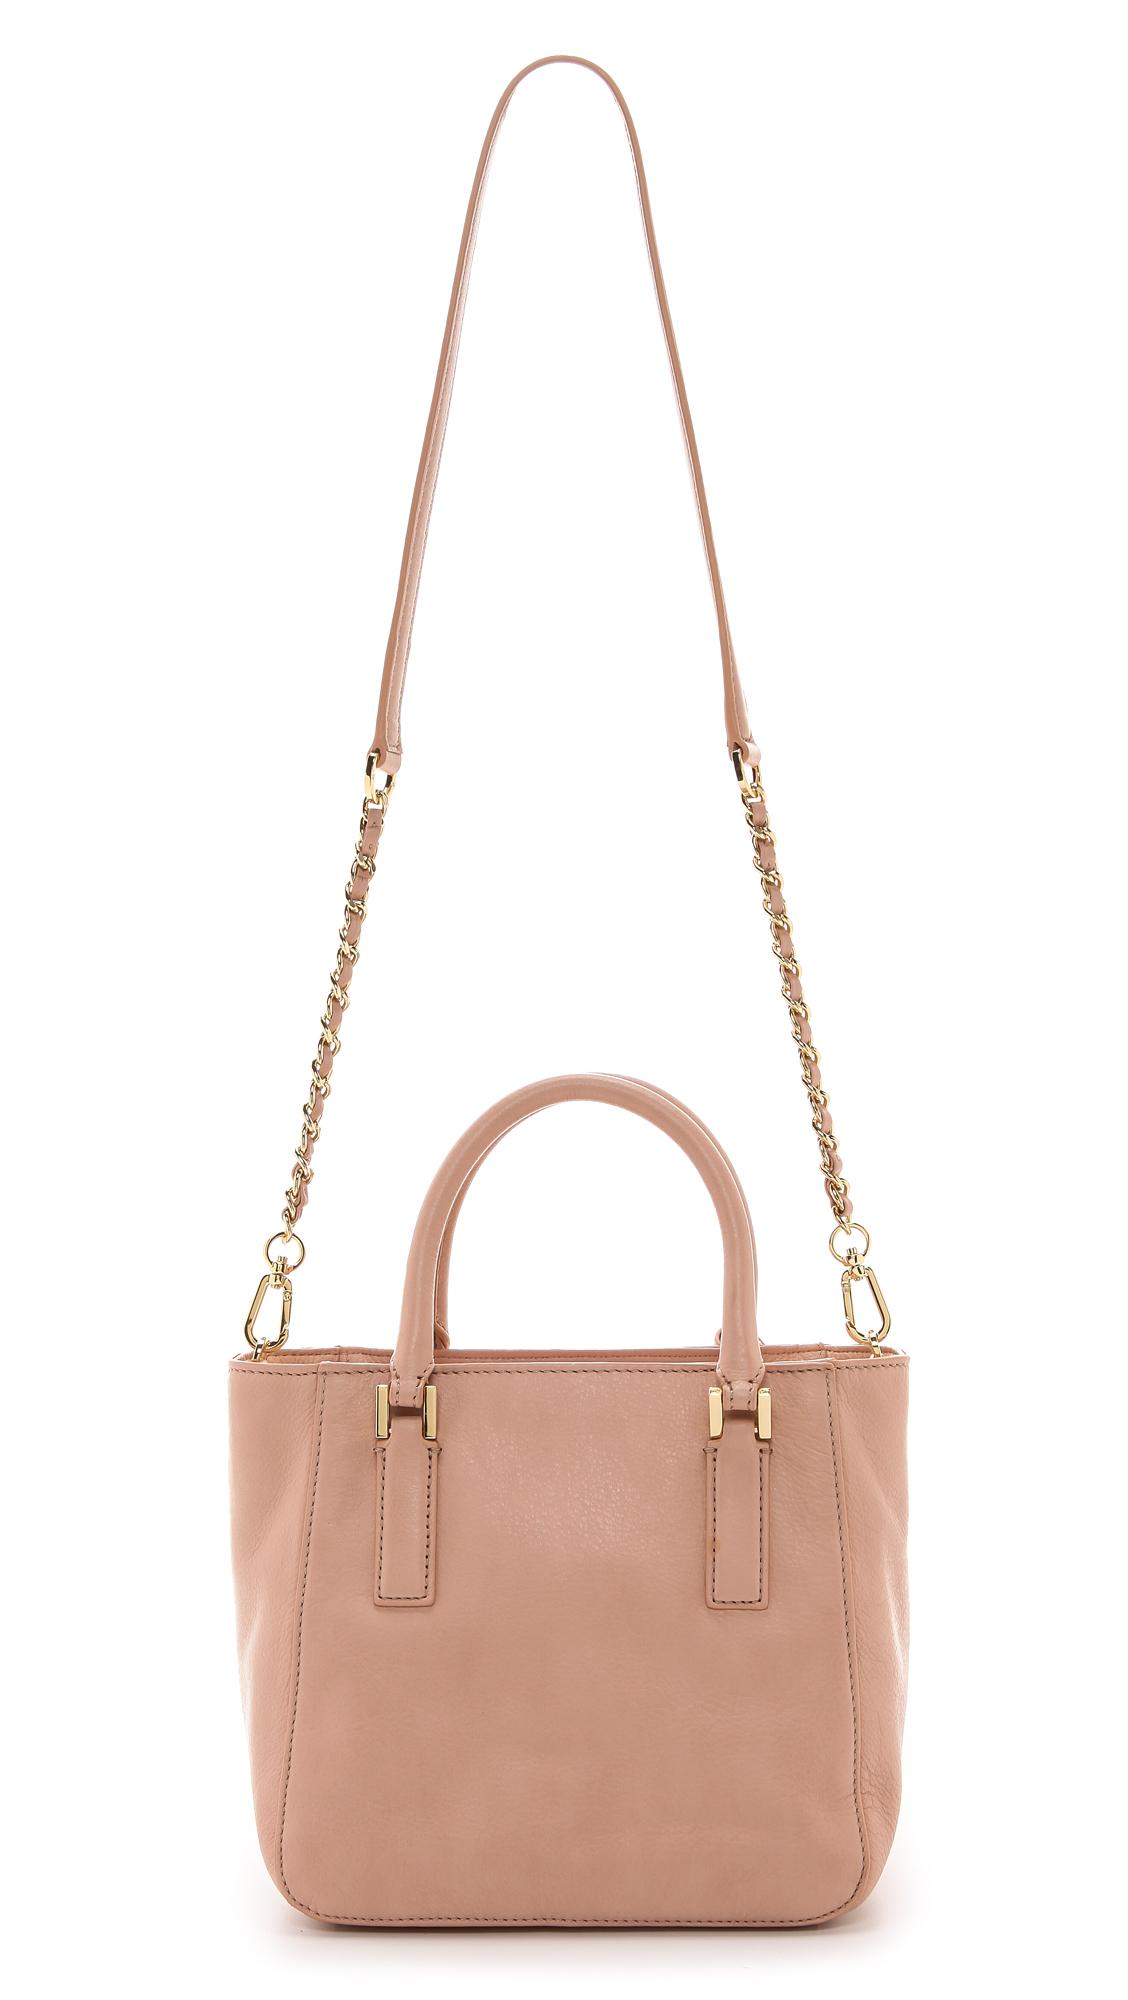 169af1127ea0 Lyst - Tory Burch Thea Mini Bucket Bag Black in Pink